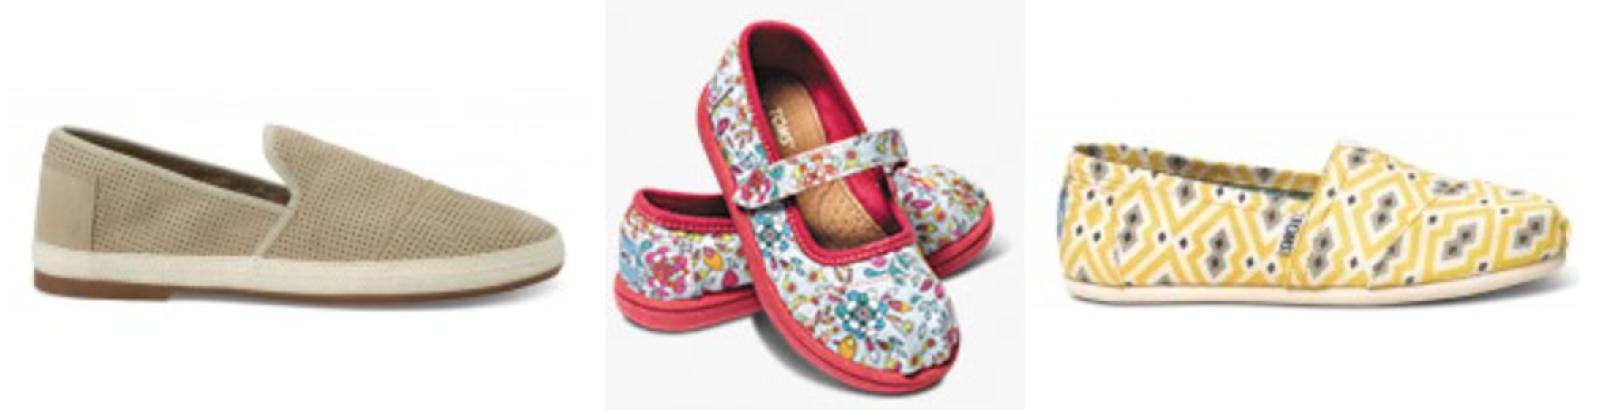 Walmart Skate Shoes Review